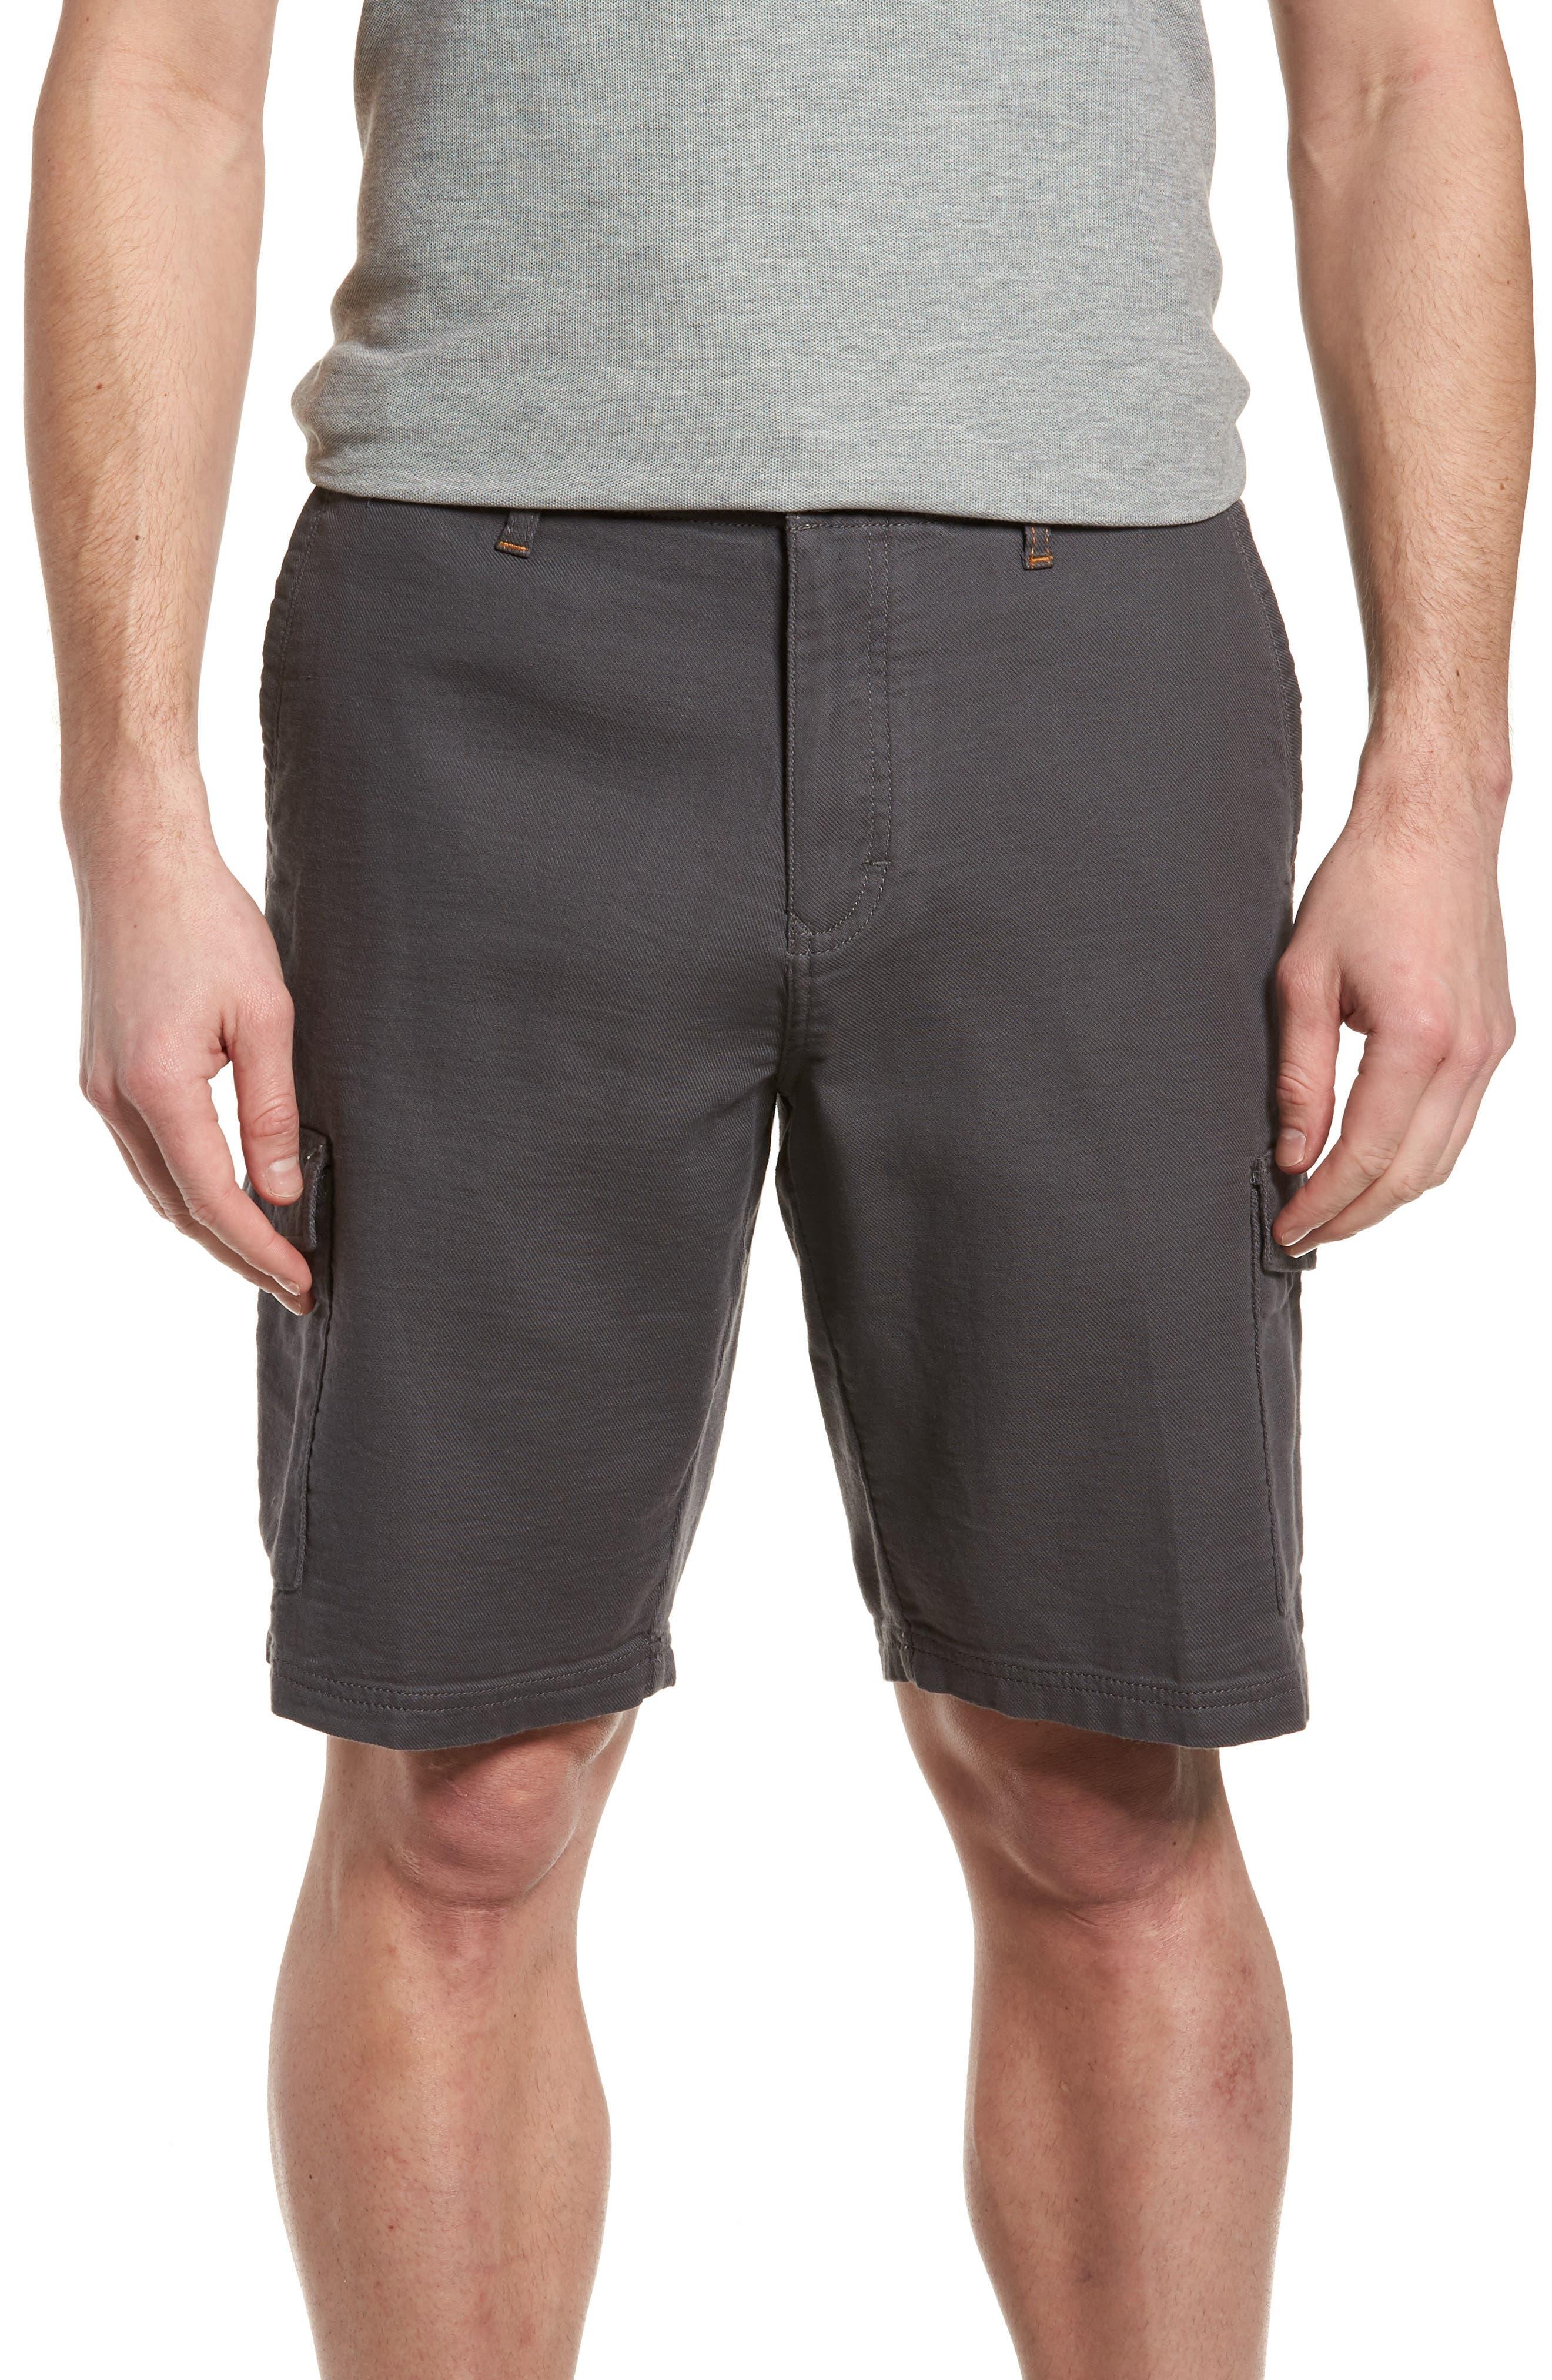 Edgewood Cargo Shorts,                             Main thumbnail 1, color,                             050